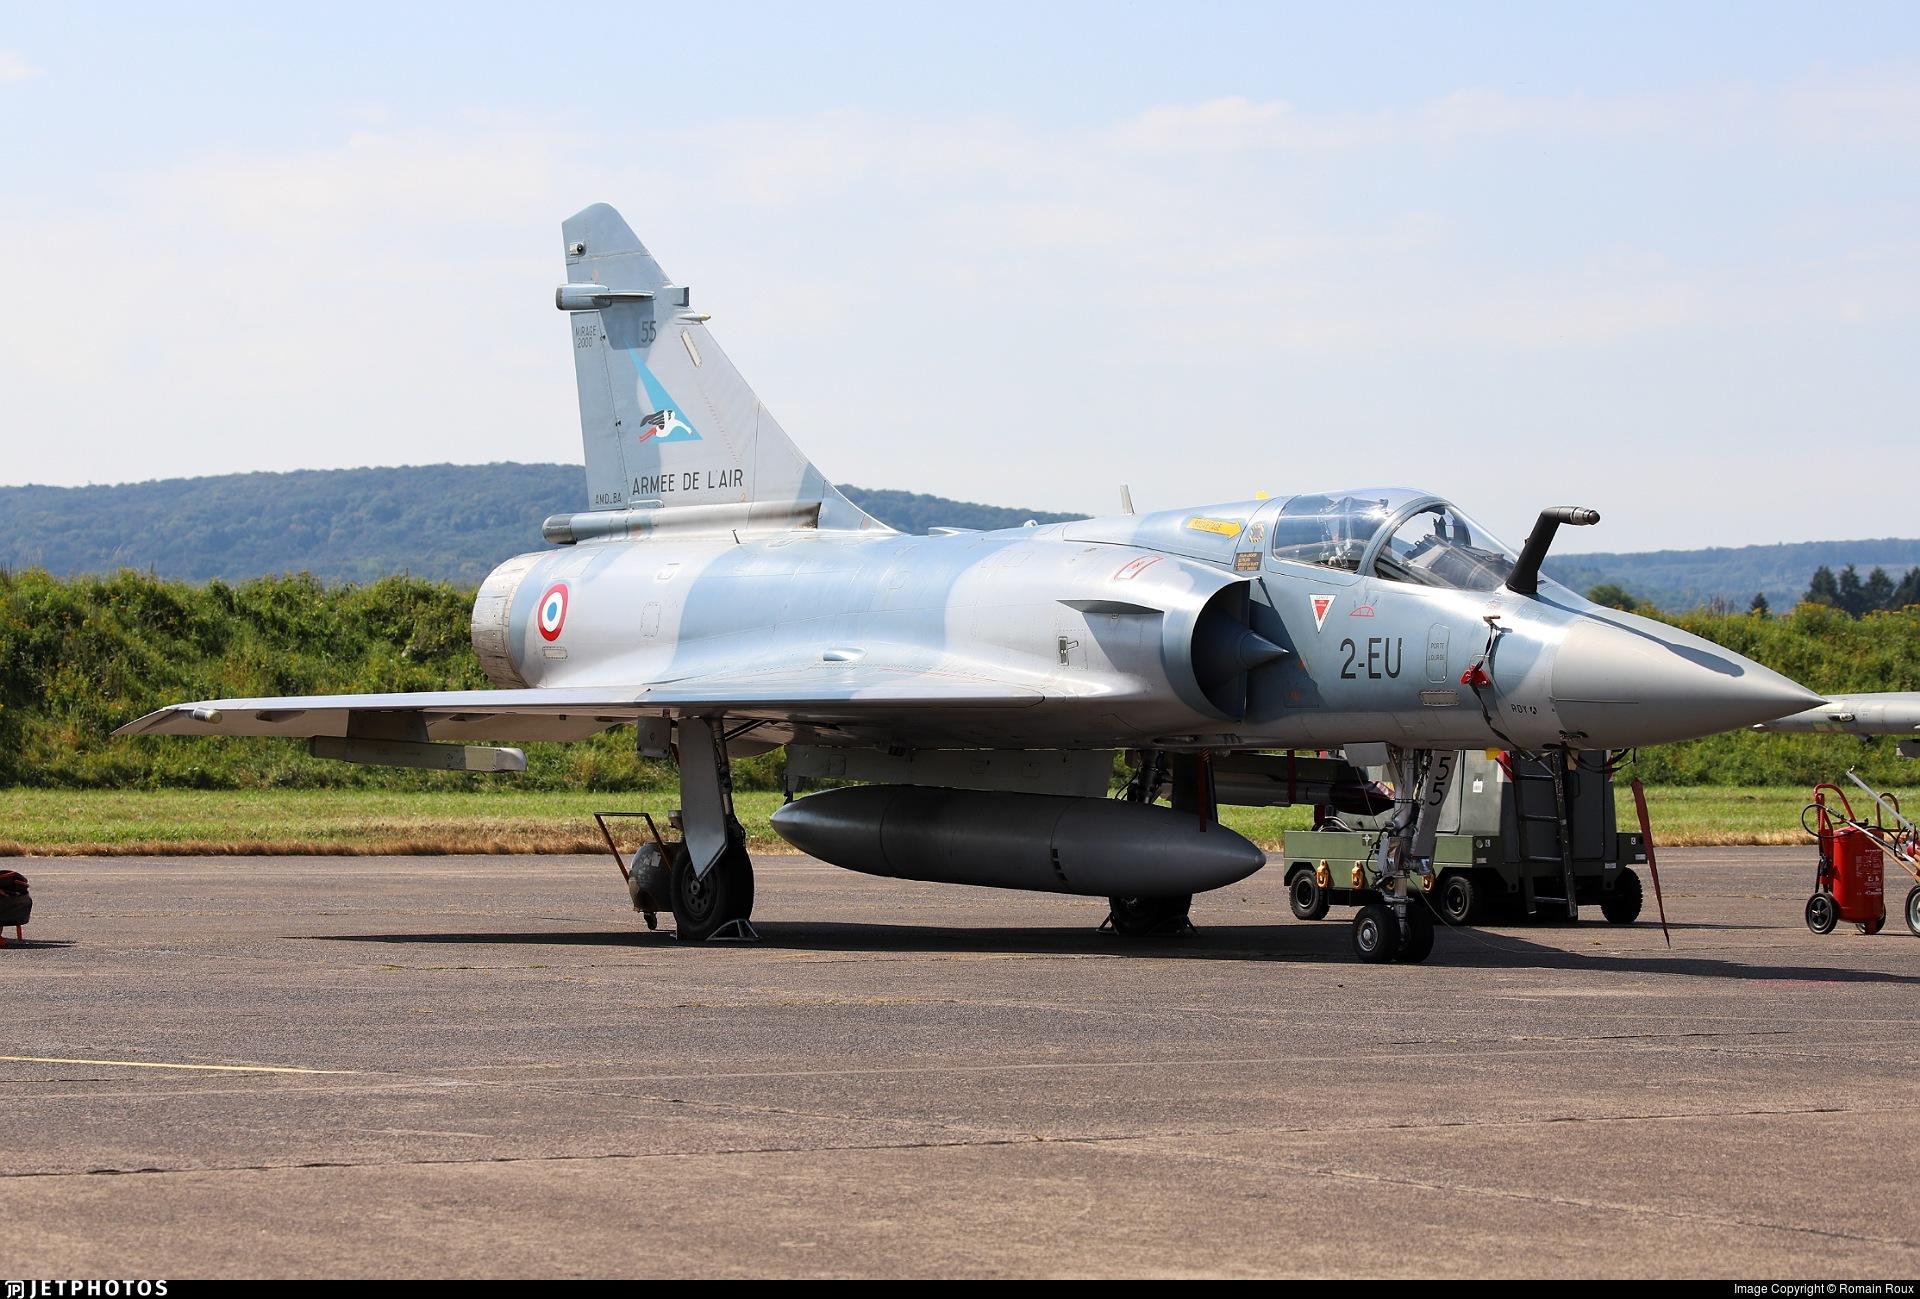 55 - Dassault Mirage 2000-5F - France - Air Force